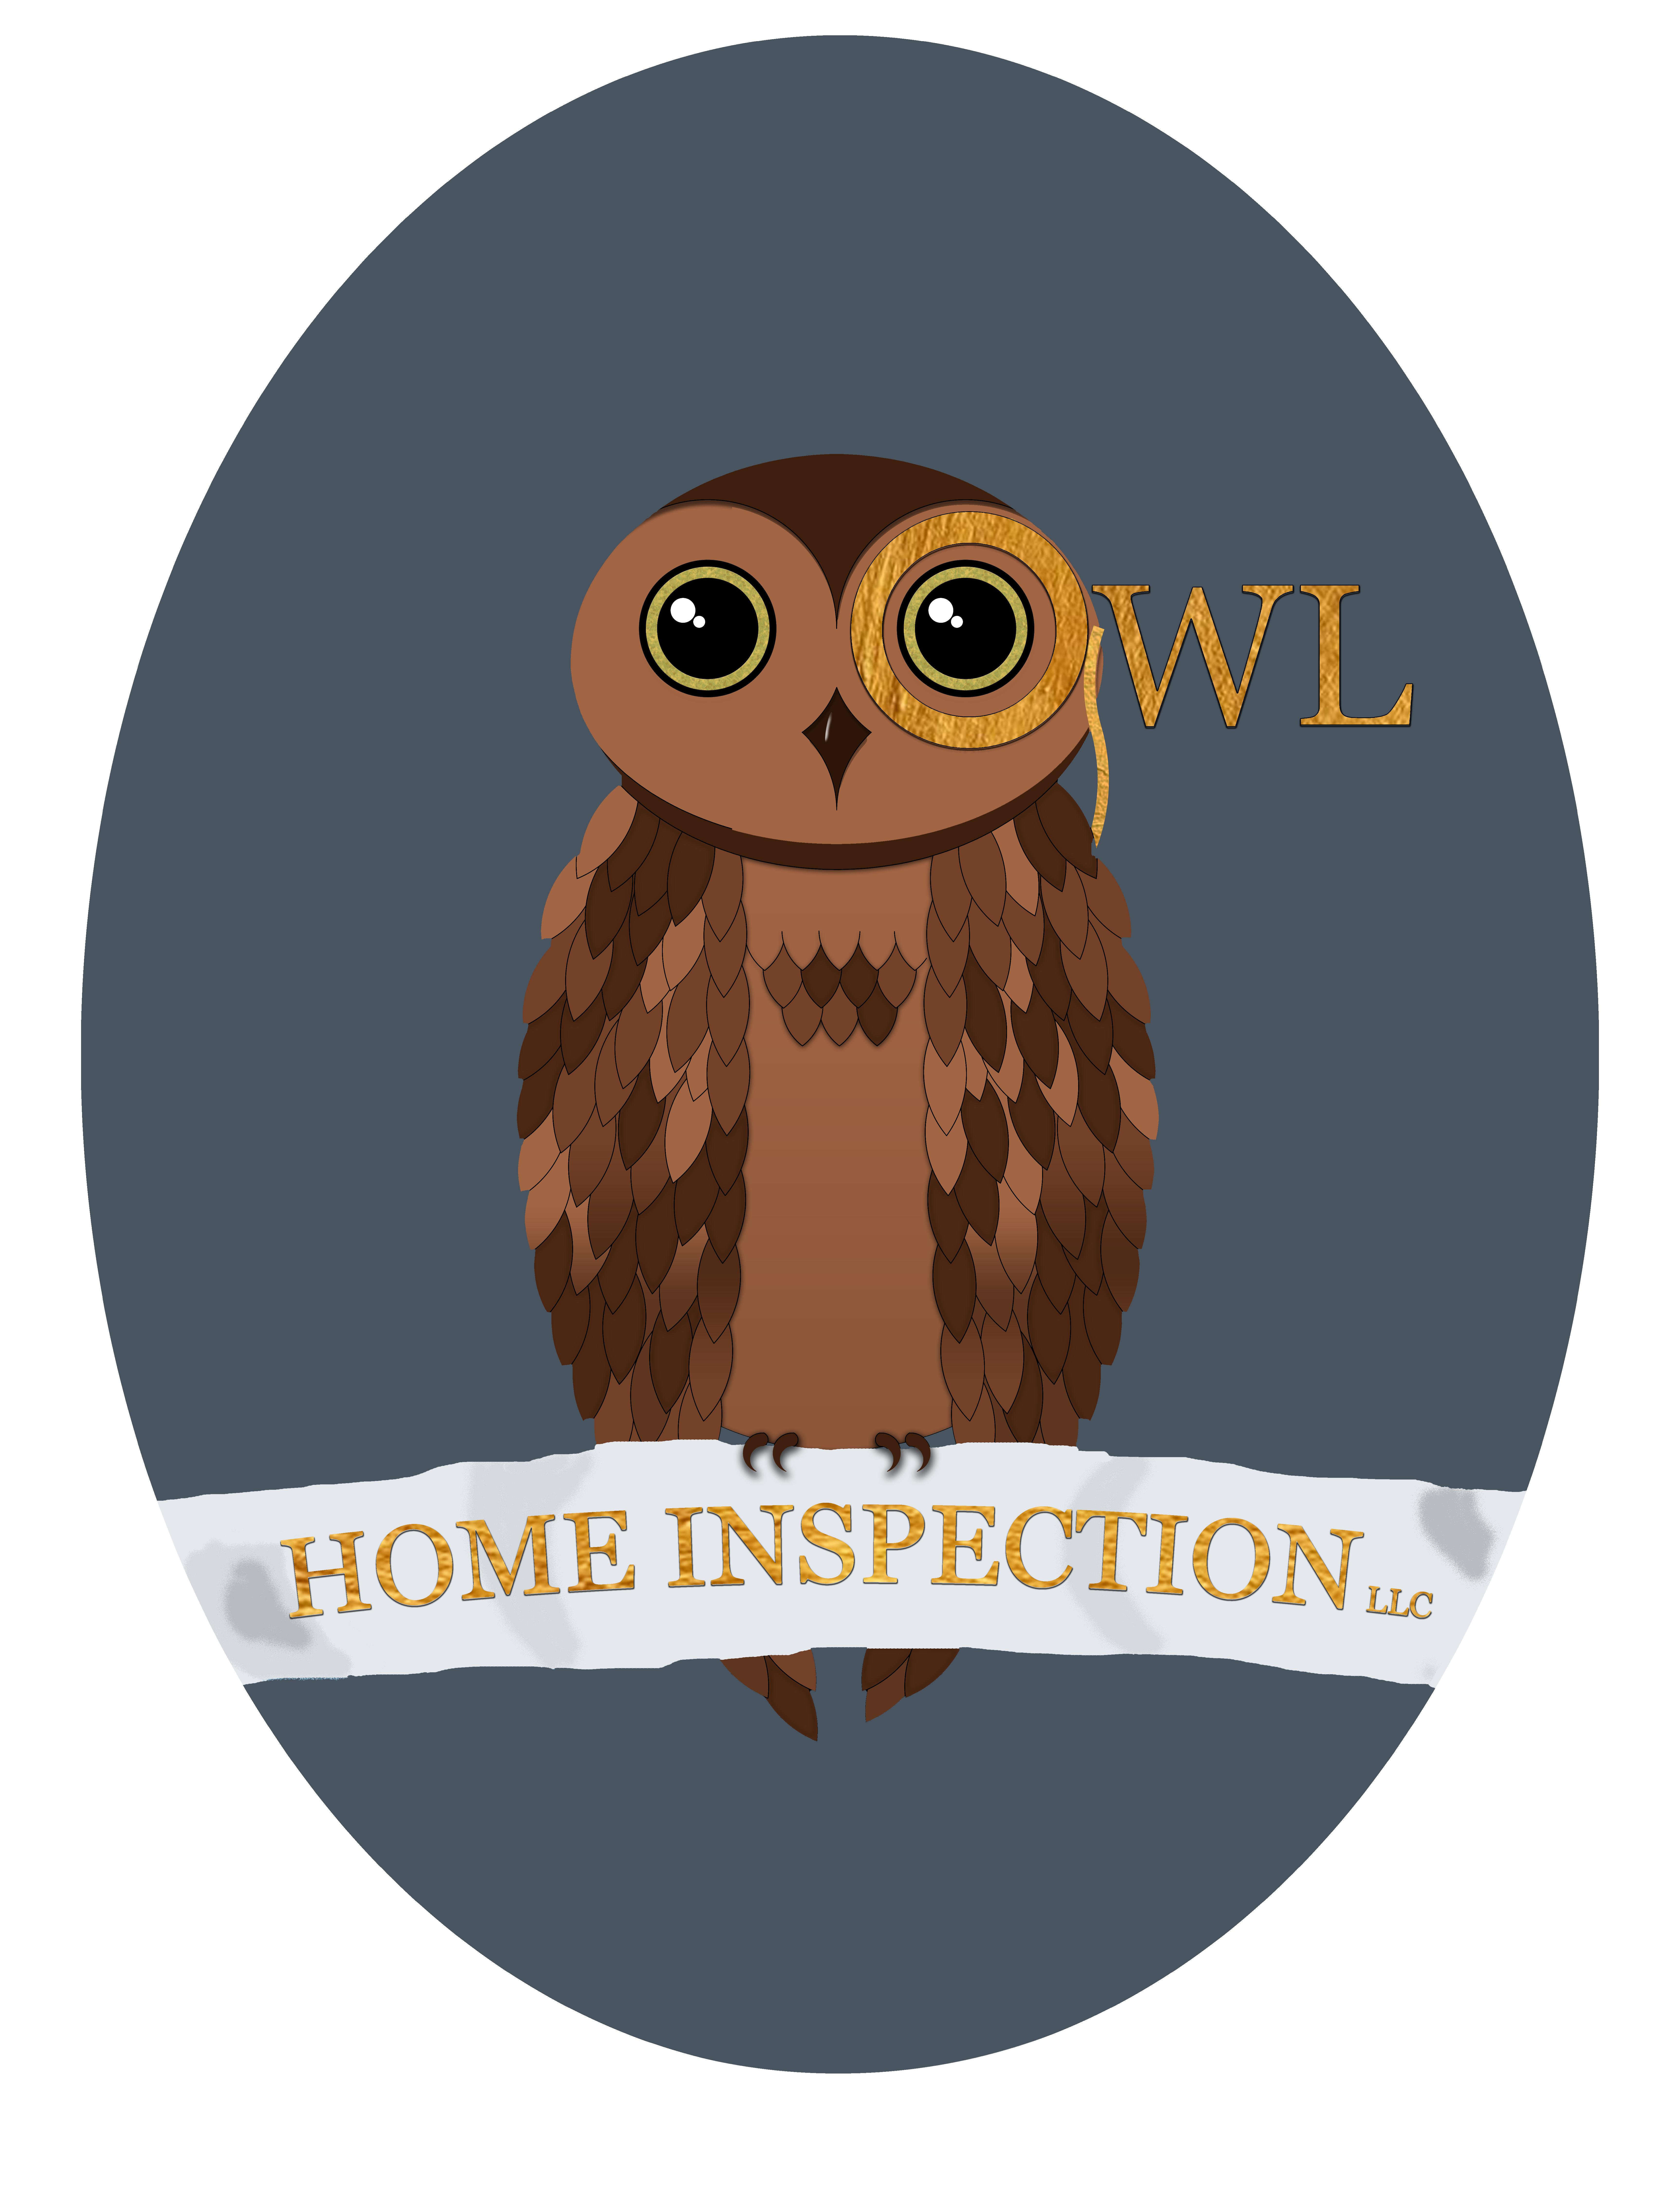 Owl home inspection logo oval